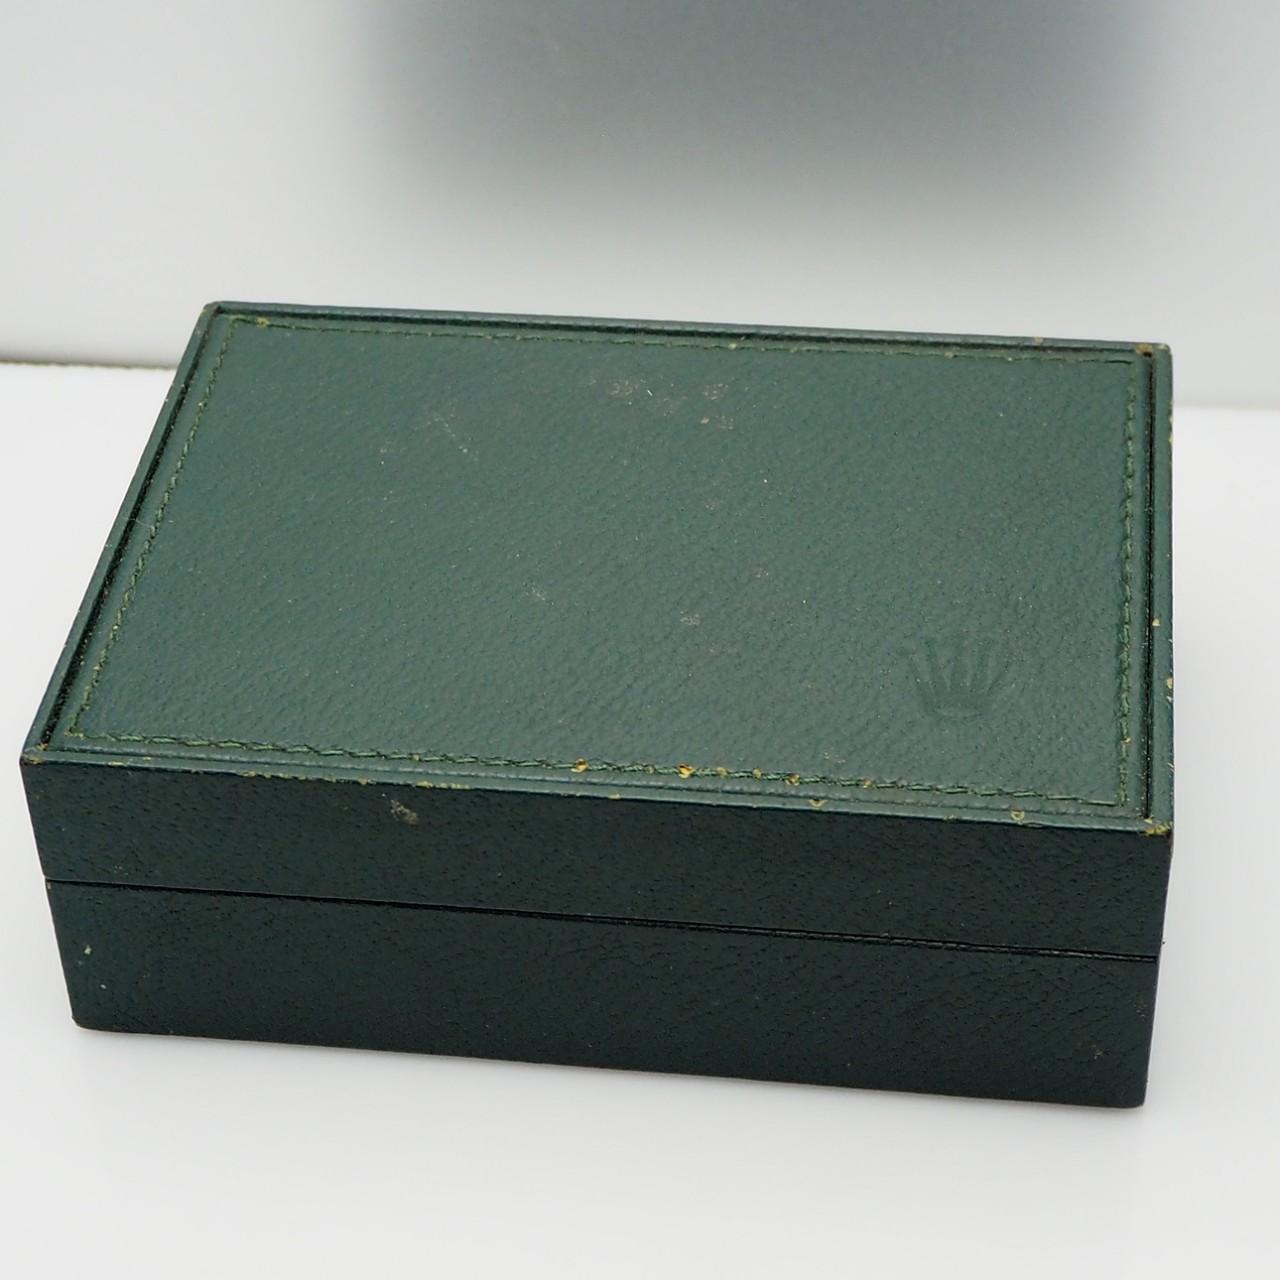 Rolex Oyster Perpetual Vintage Uhrenbox/ Box/ Holzbox 68.00.55